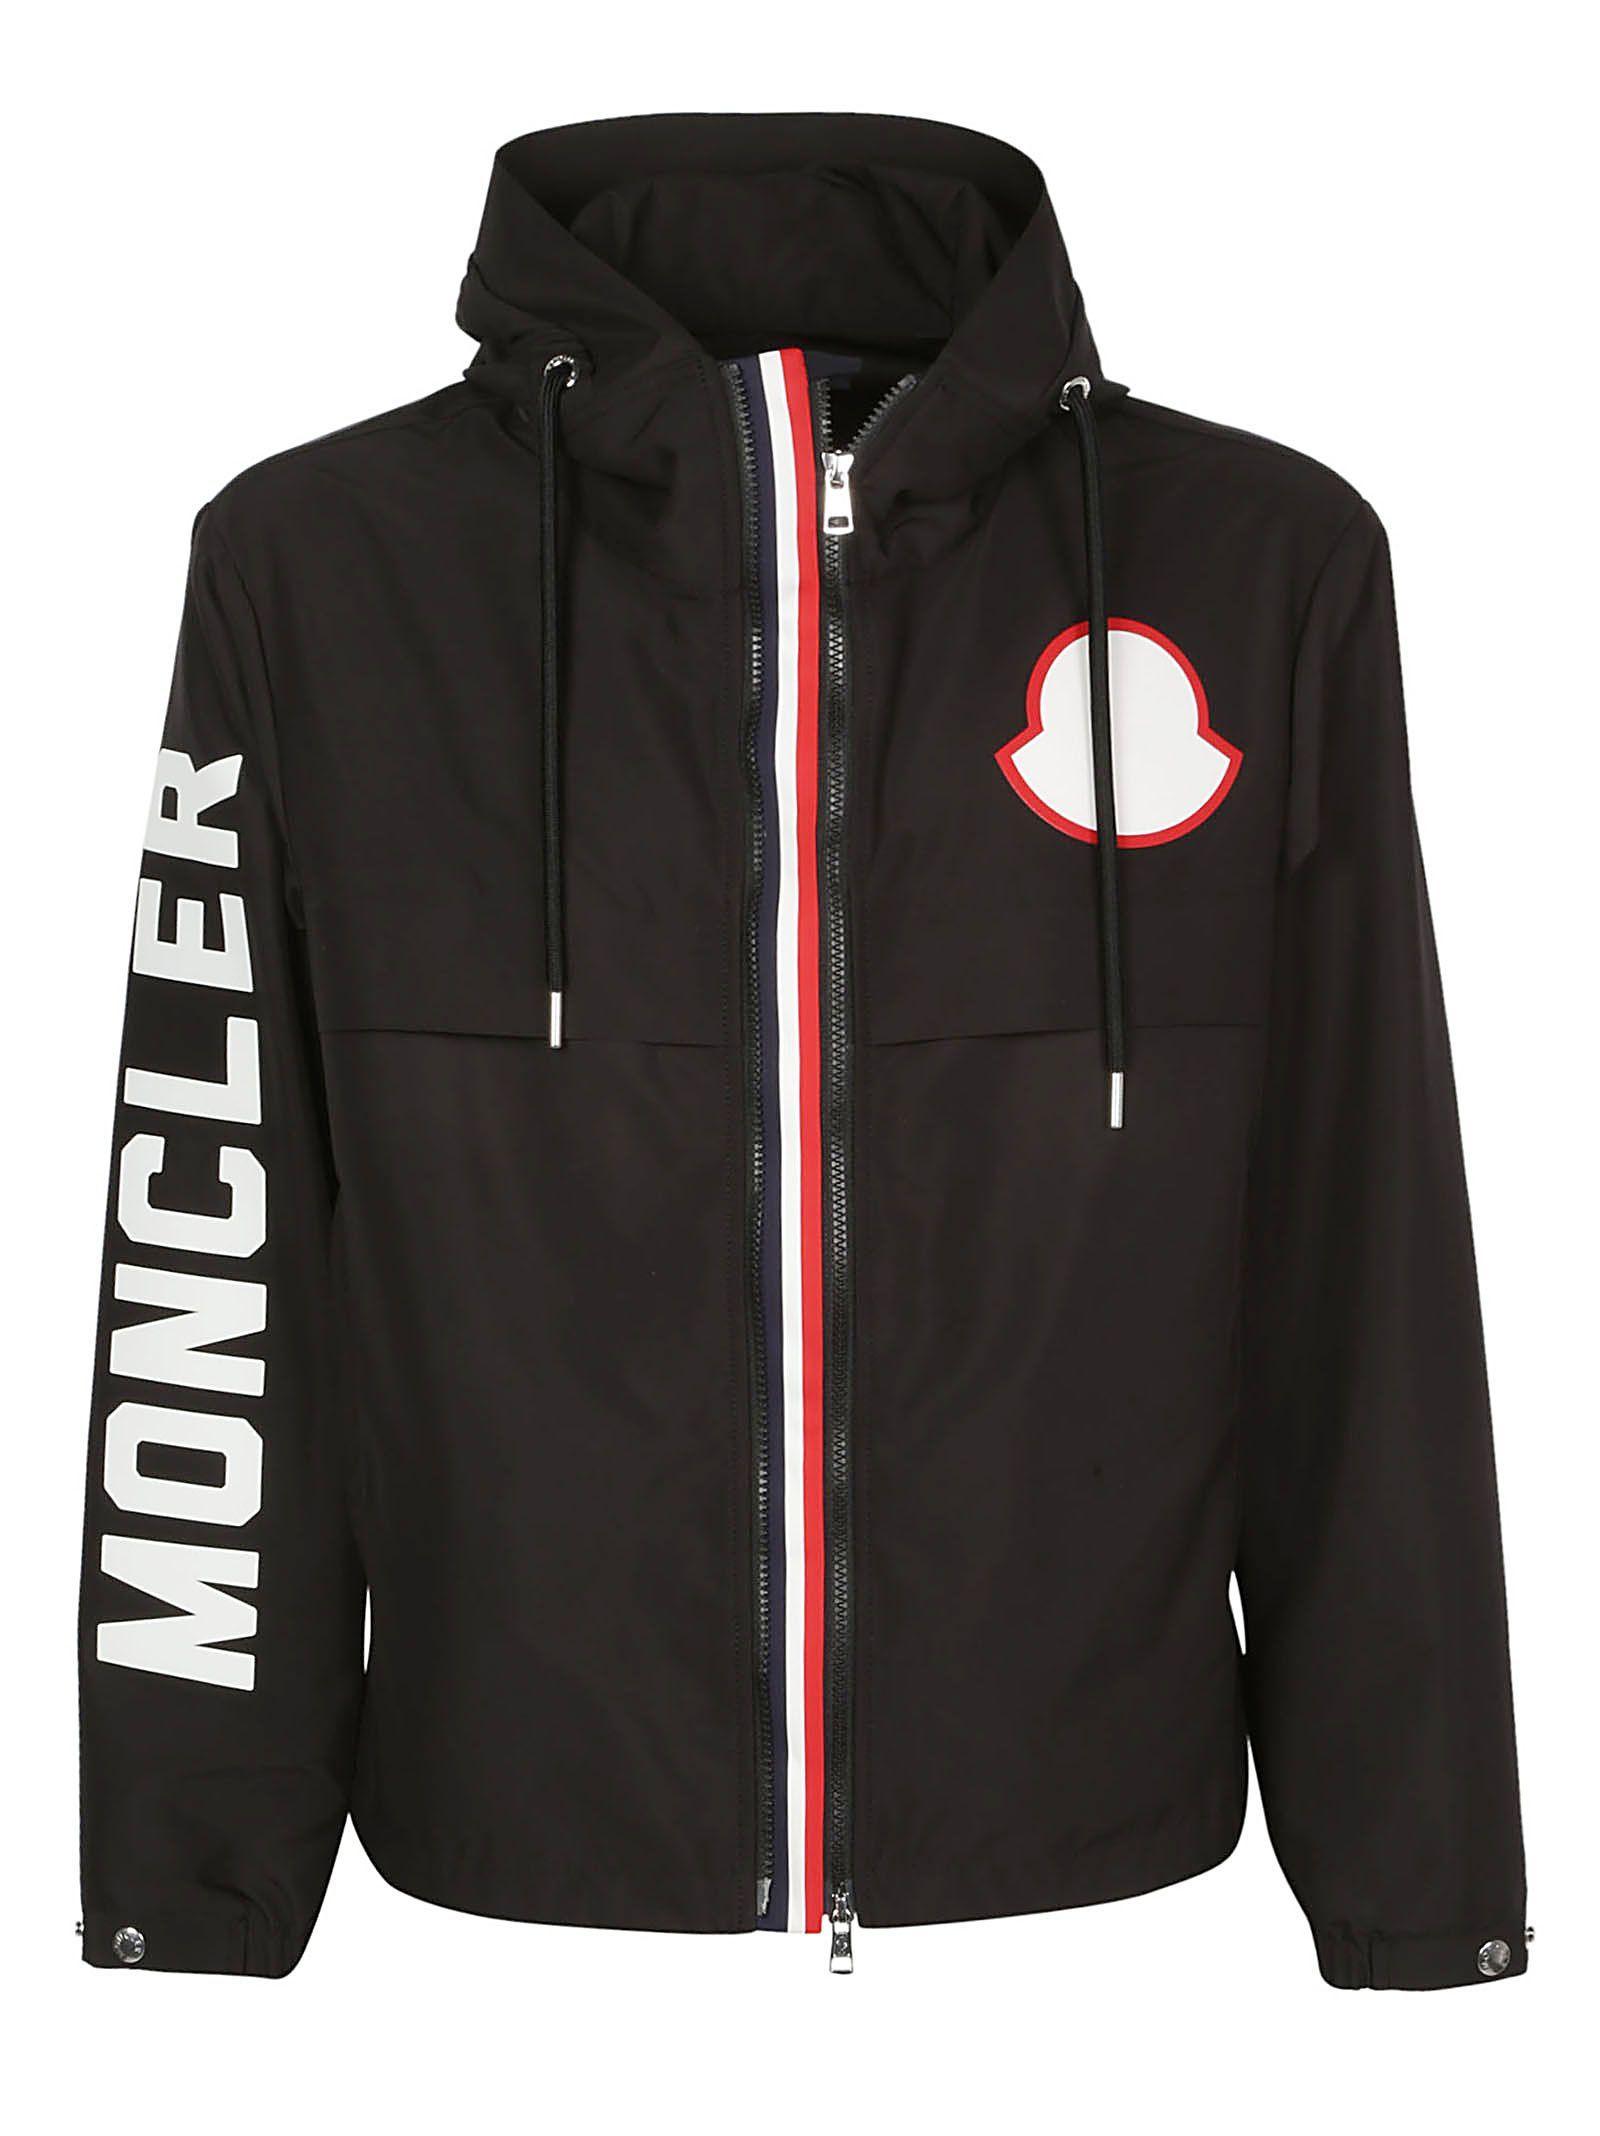 MONCLER MONTREAL JACKET. moncler cloth Jackets